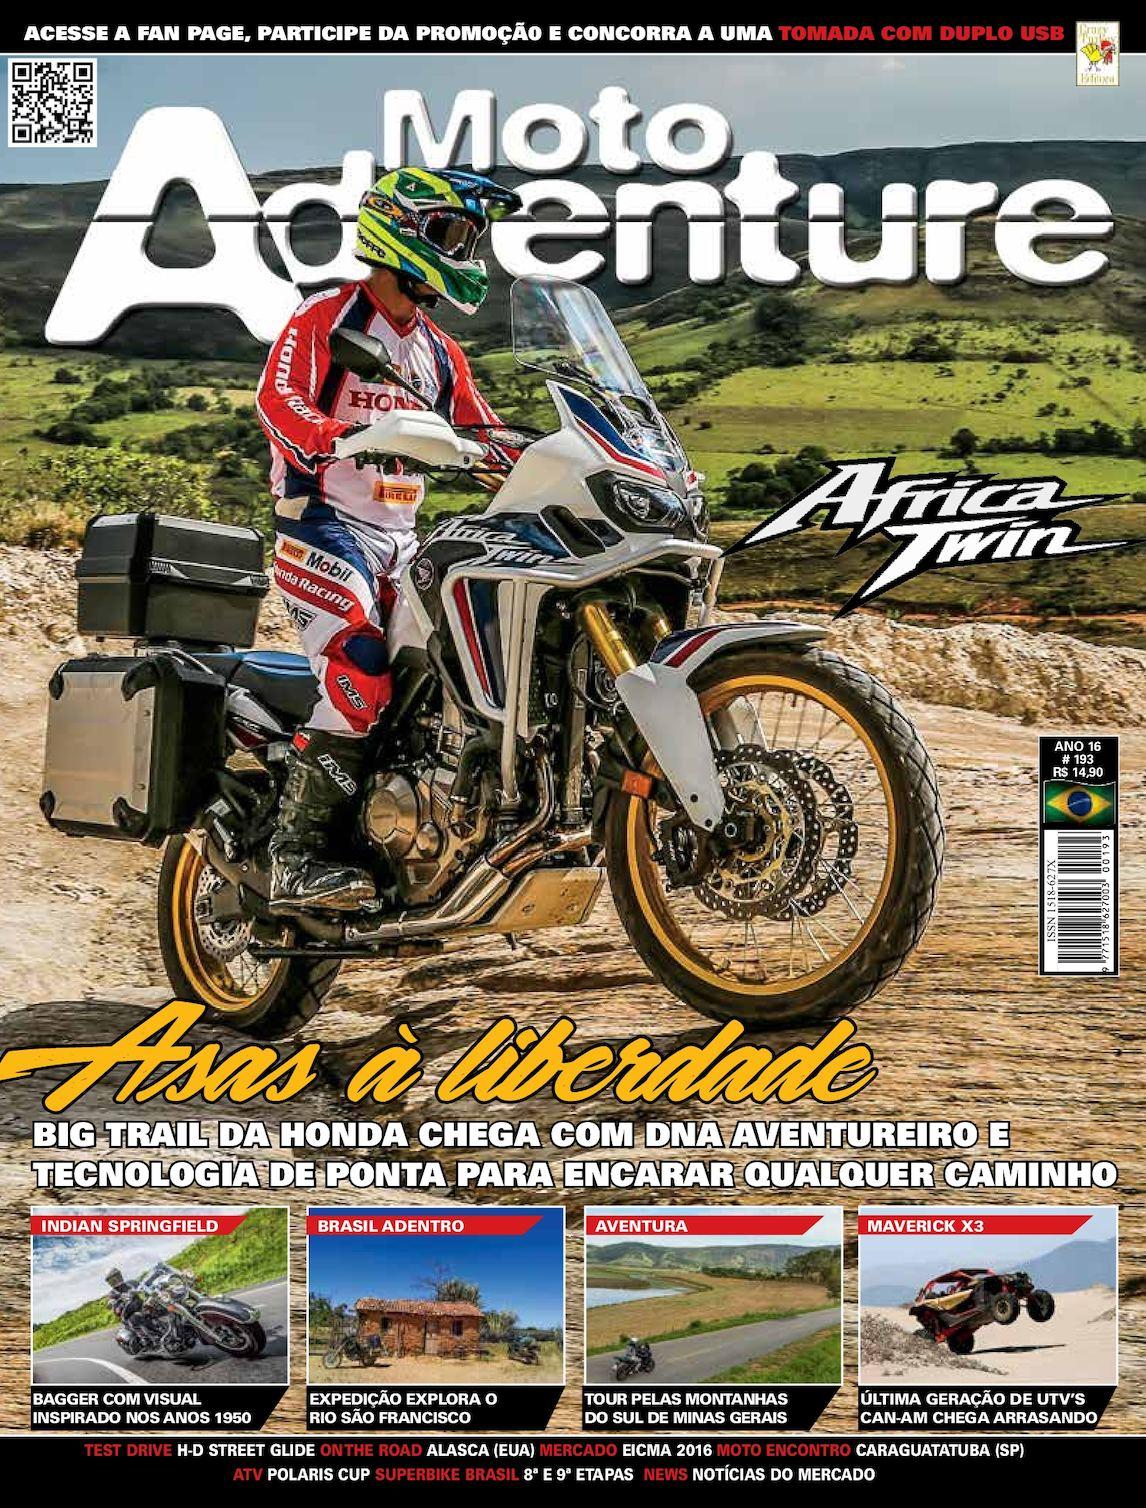 Calaméo - Moto Adventure 193 e7dc154705c